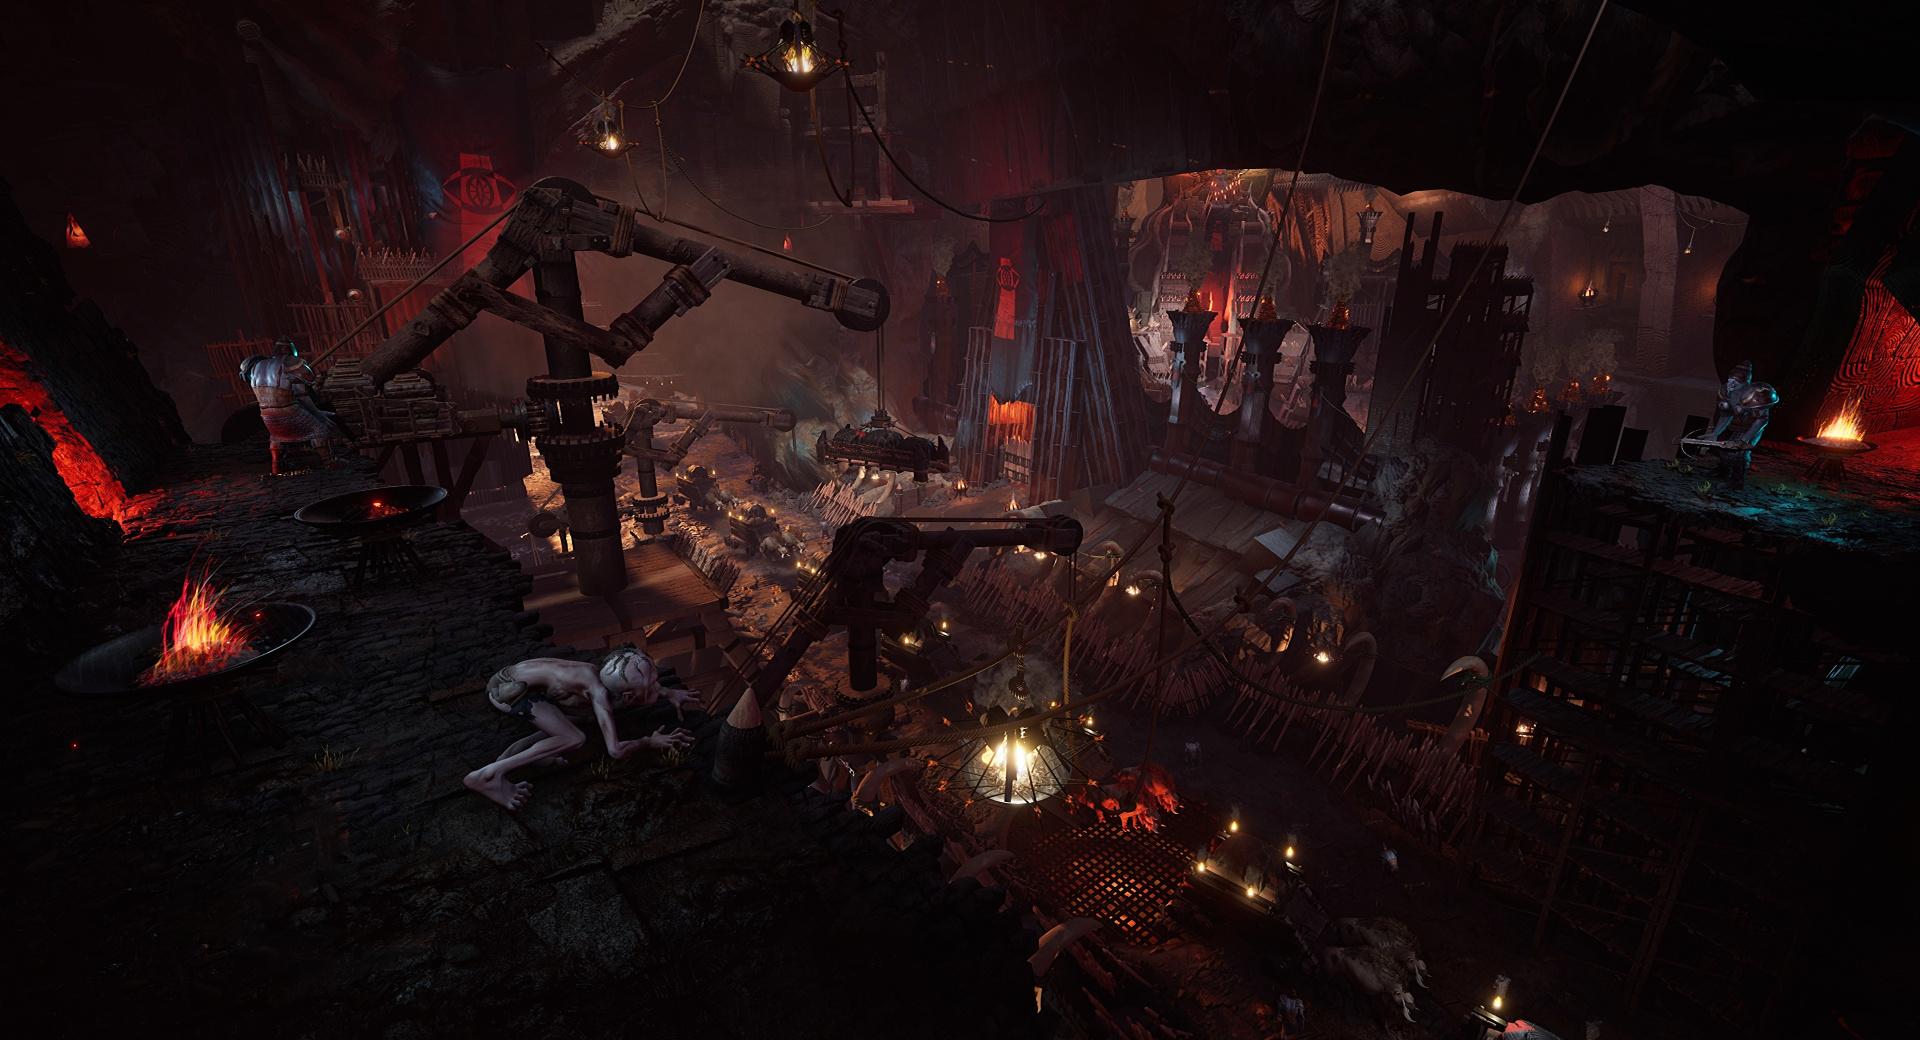 The Lord of the Rings: Gollum для PS5: рейтрейсинг, SSD и поддержка DualSense